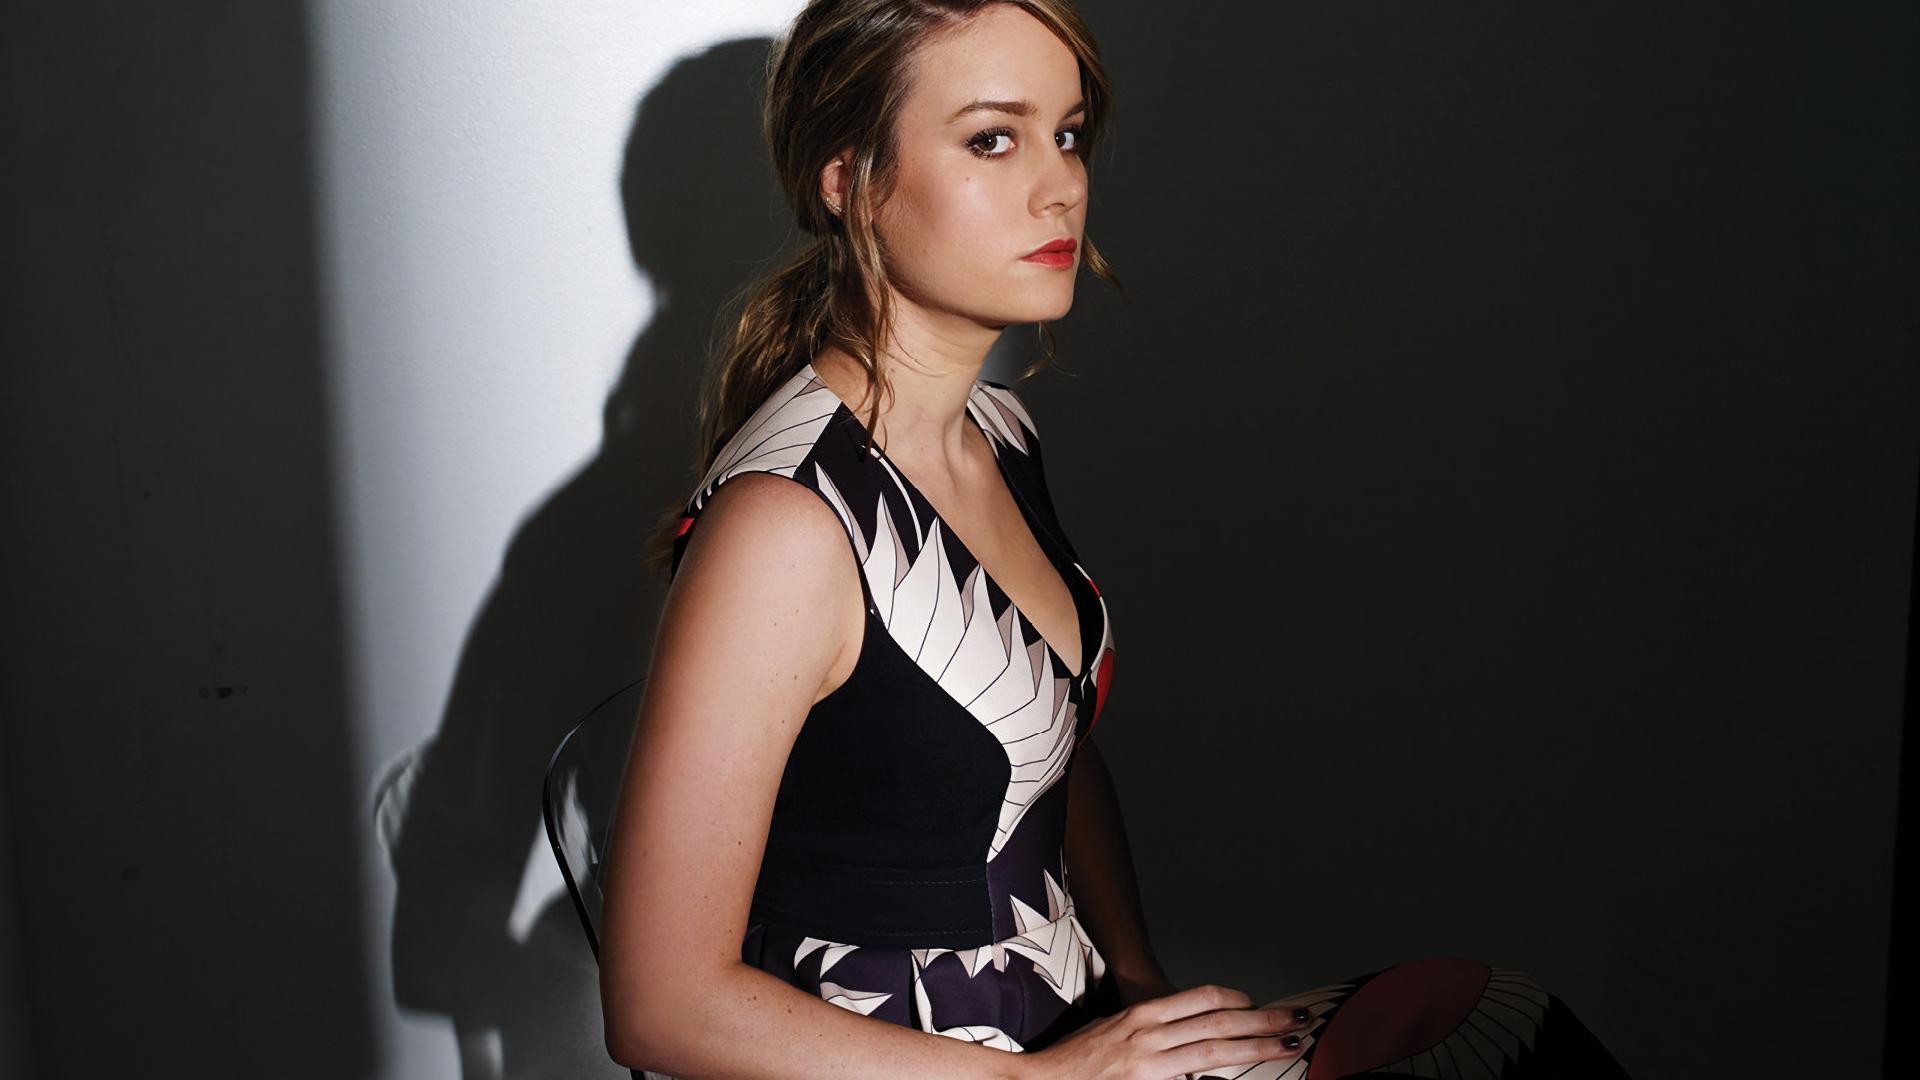 Wallpaper Brie Larson, celebrity, sitting